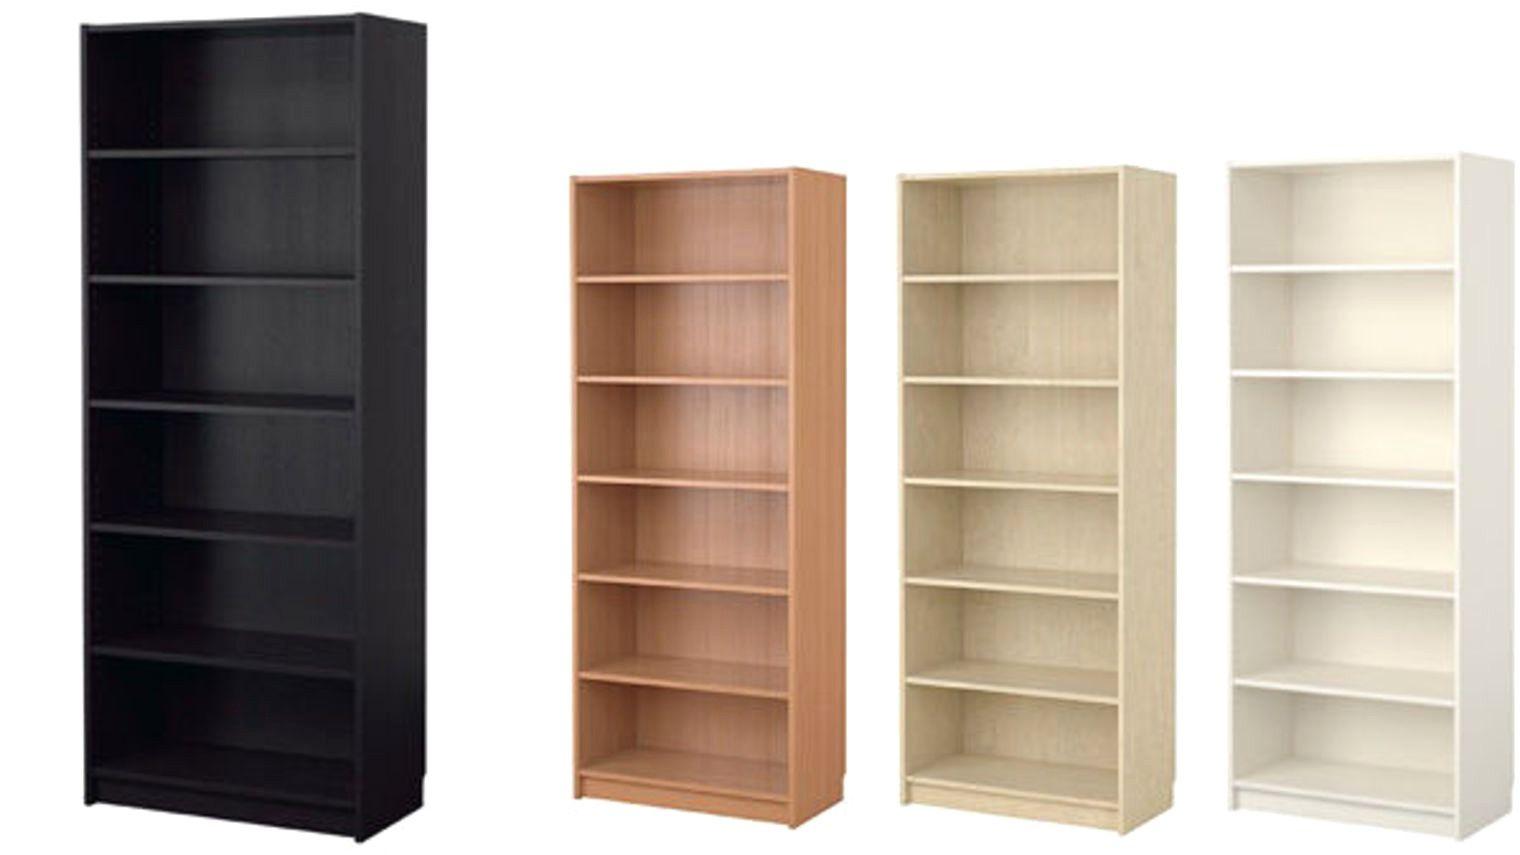 13 Moyen Ikea Etagere Rangement Minimalis